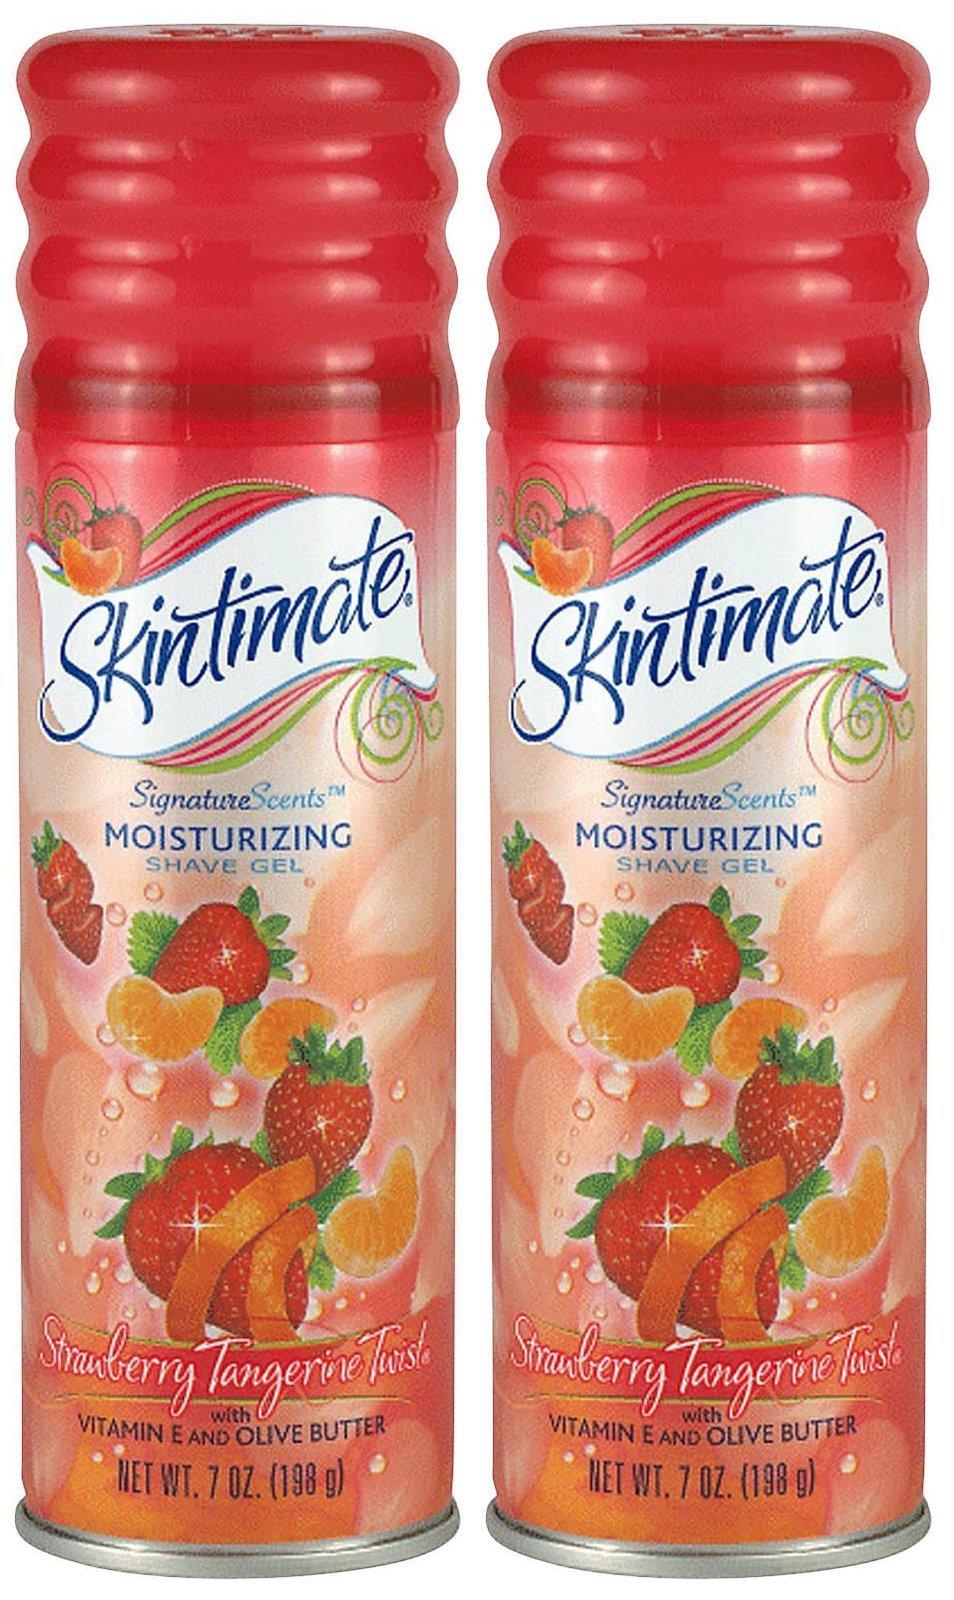 Skintimate Signature Scents Moisturizing Shave Gel, Strawberry Tangerine Twist - 7 oz - 2 pk